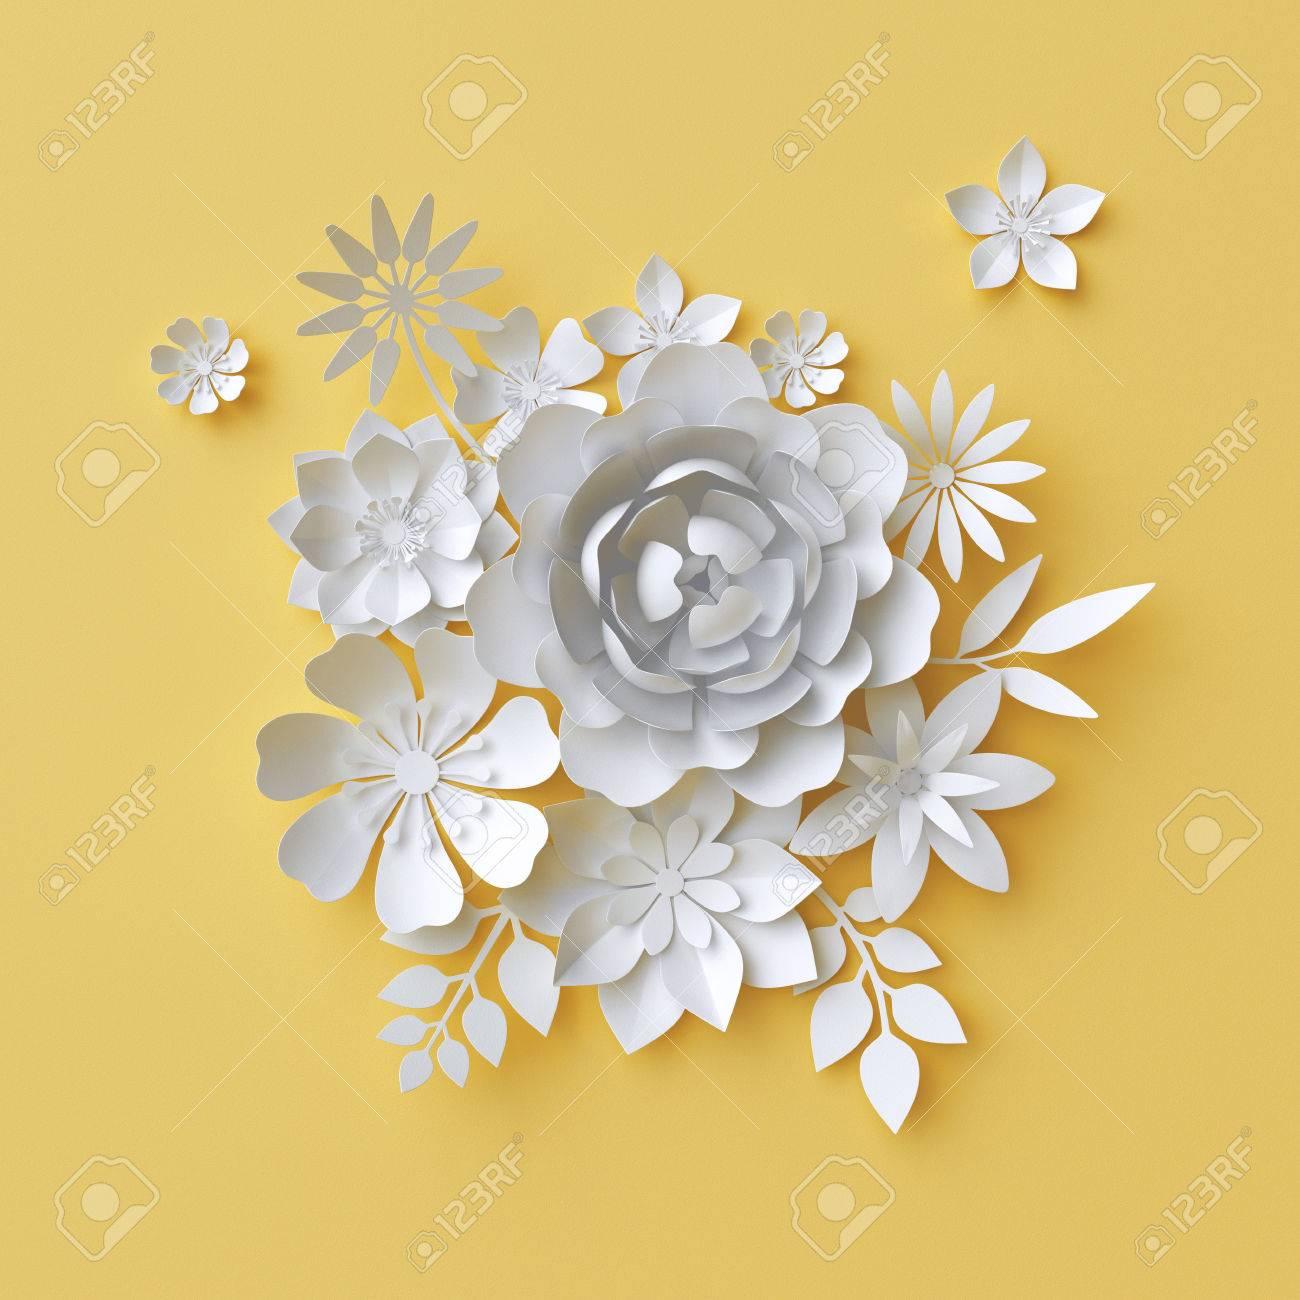 3d Render, Digital Illustration, White Paper Flowers On Yellow ...